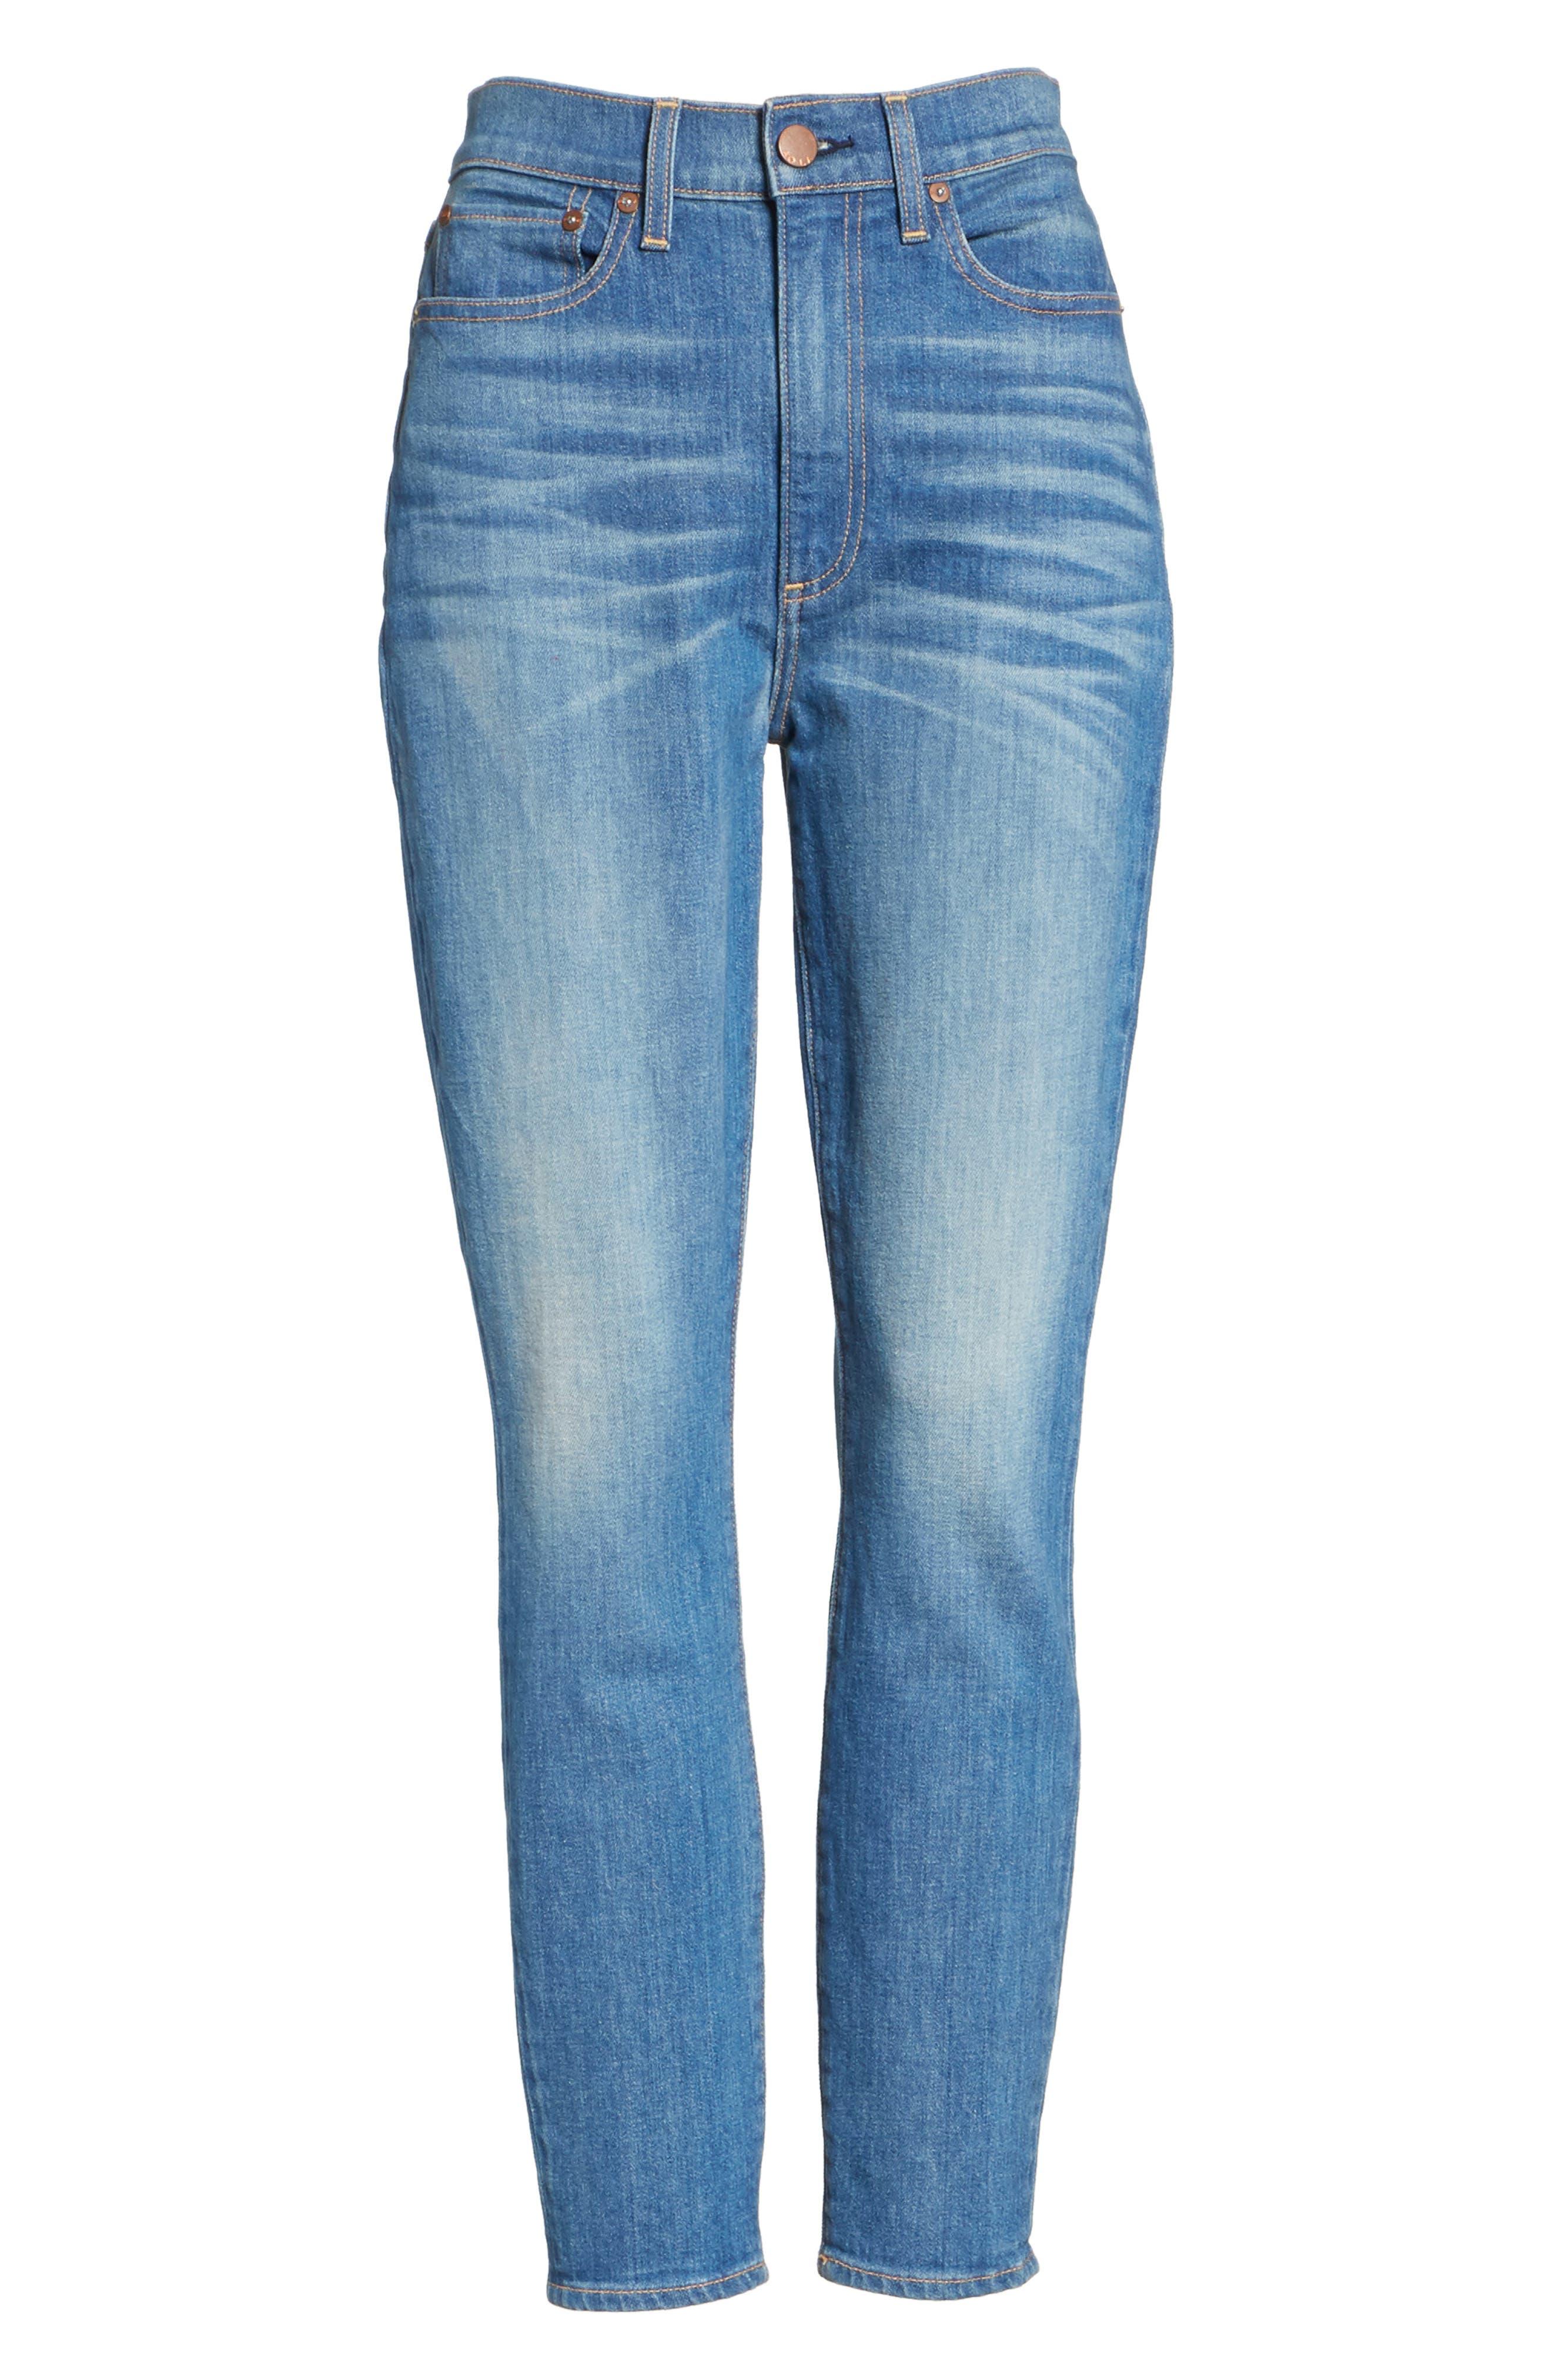 AO.LA Good High Waist Ankle Skinny Jeans,                             Alternate thumbnail 6, color,                             Side Hustle